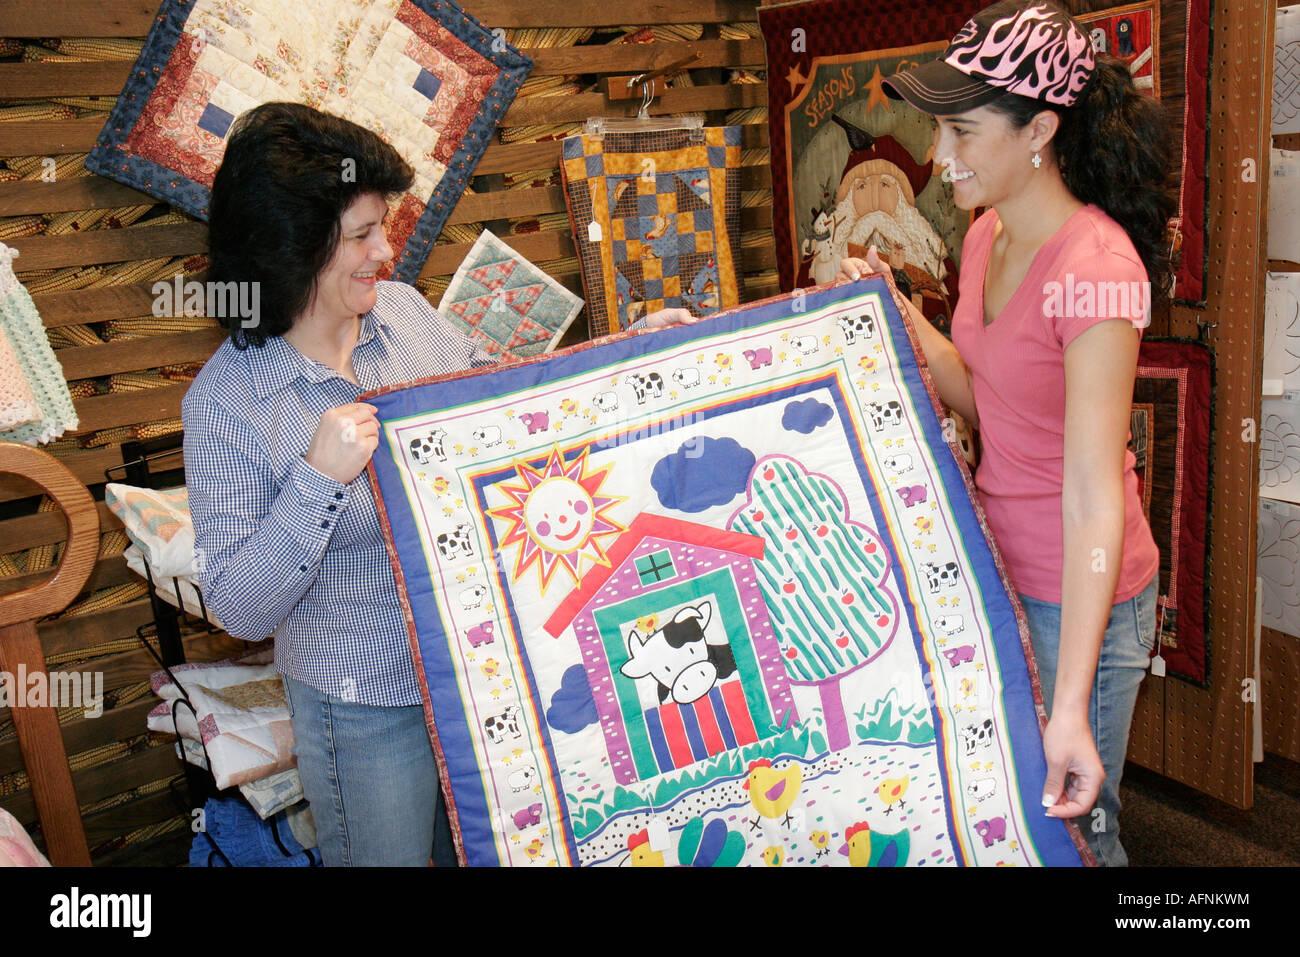 Indiana Middlebury Das holandés Essenhaus Village Tienda regalos estilo  Amish quilt madre hija adolescente Imagen De 79b6e732bde